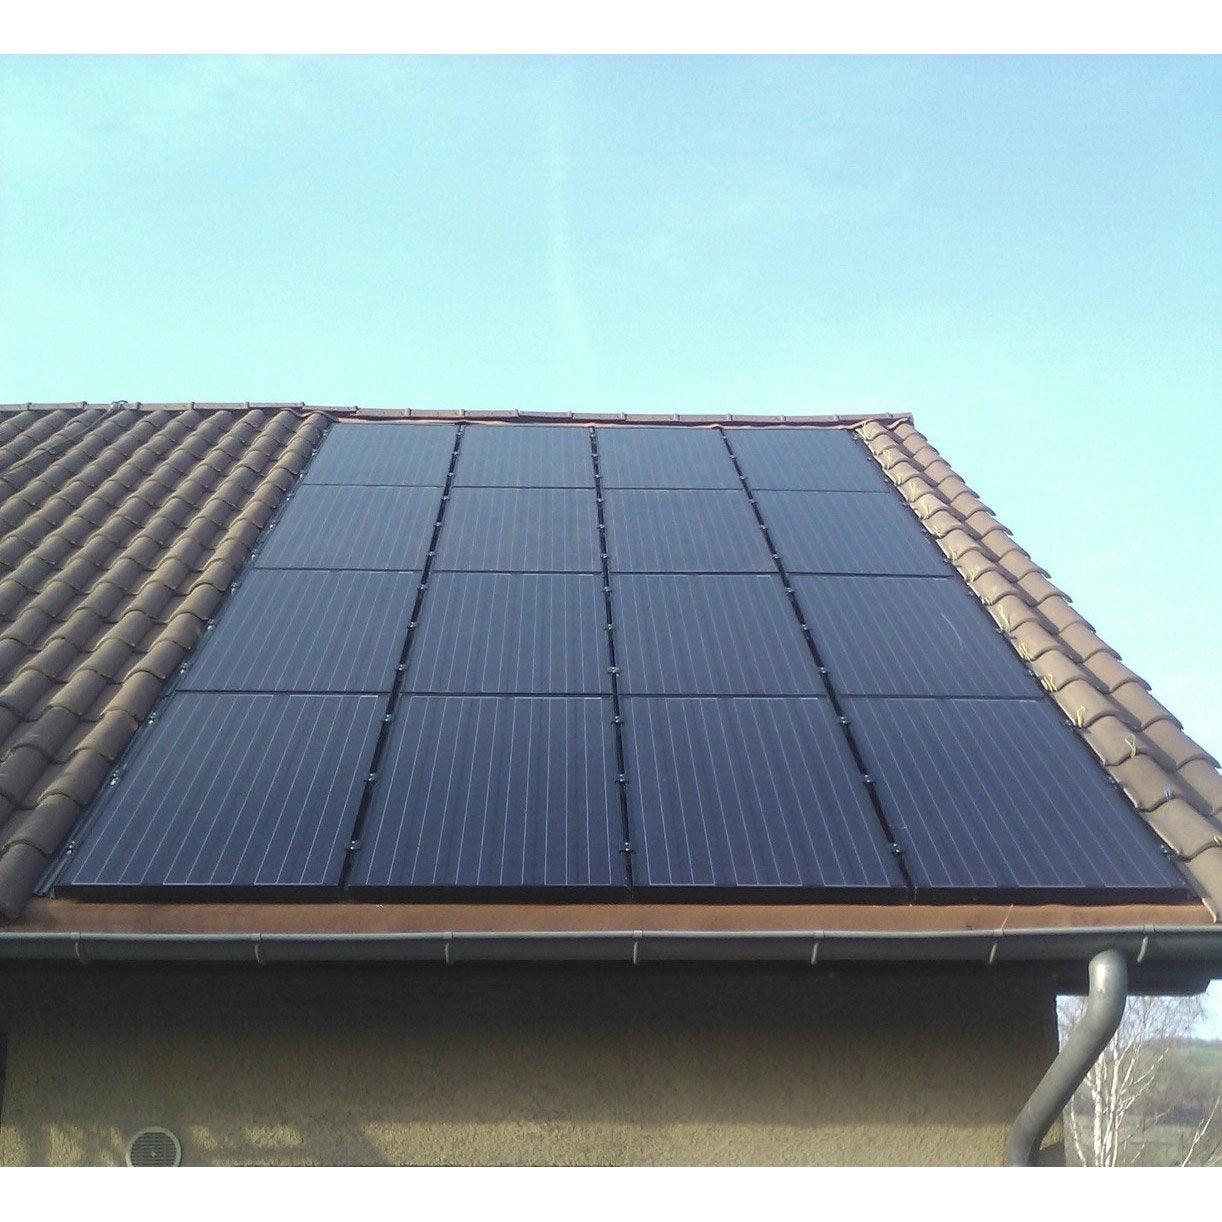 kit solaire photovolta que premium int gr watt home 2450w leroy merlin. Black Bedroom Furniture Sets. Home Design Ideas